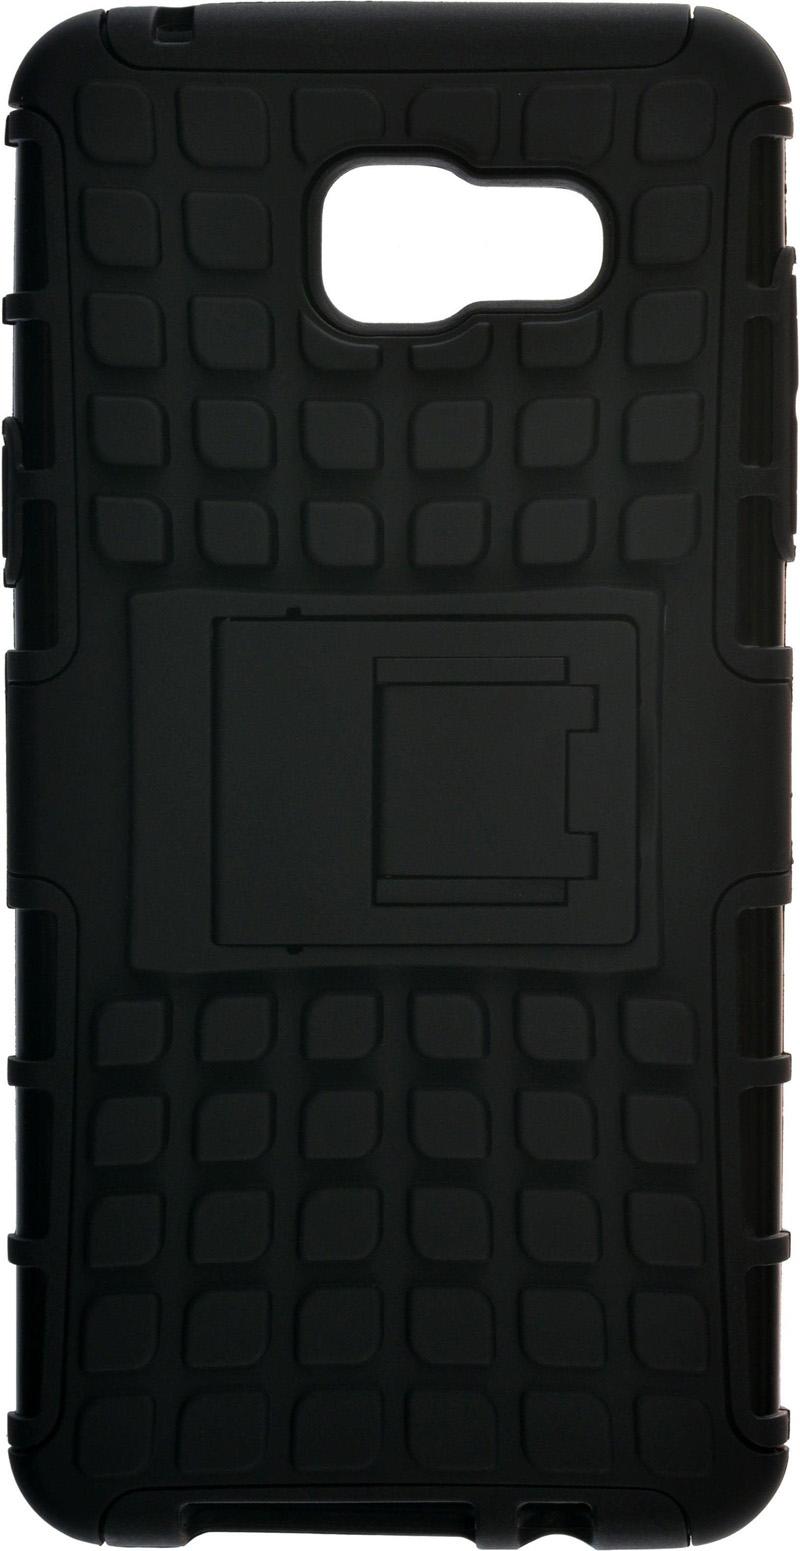 Чехол-накладка SkinBox Defender case для Samsung Galaxy A5 (2016) Black